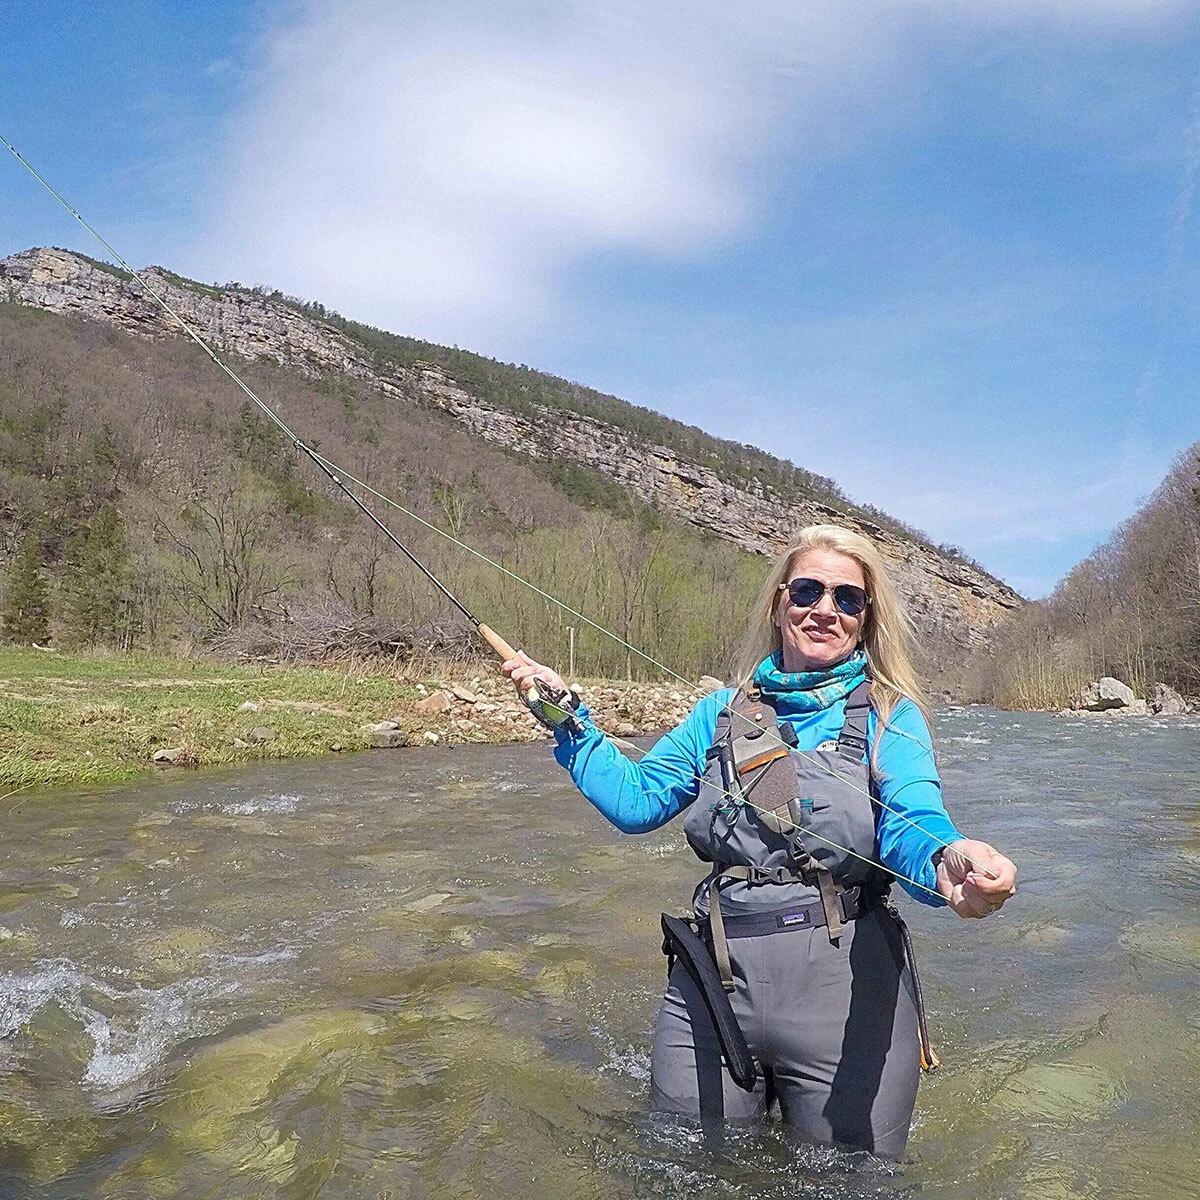 International Women's Fly Fishing Day